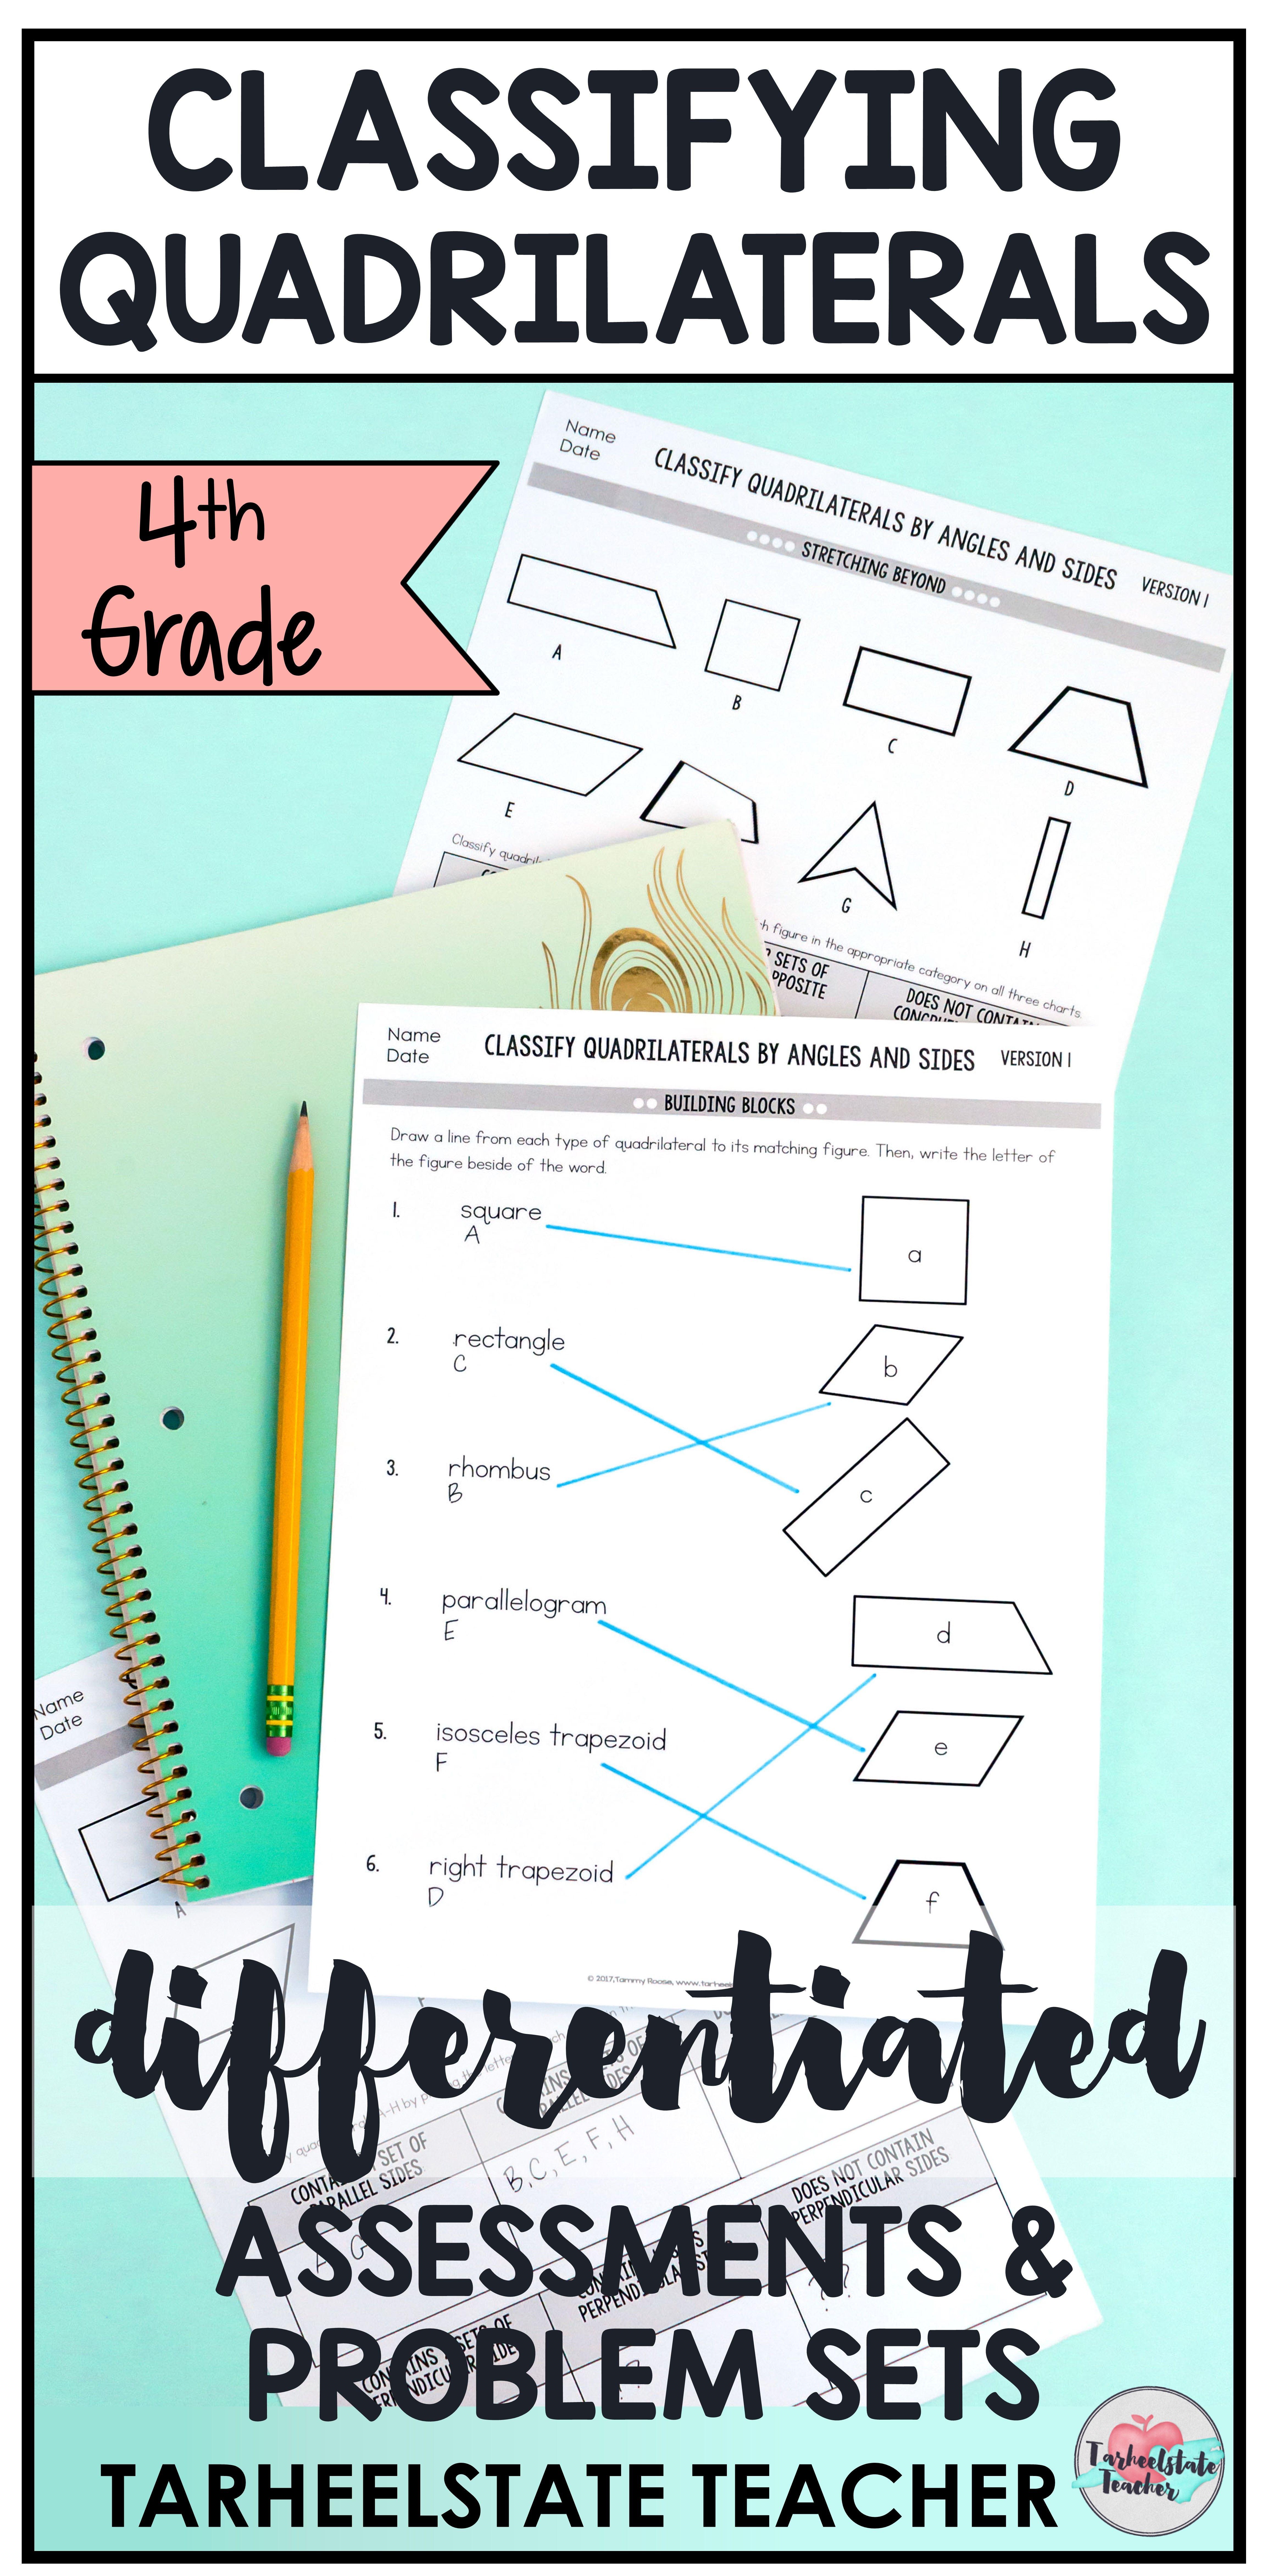 4th Grade Geometry   Classifying Quadrilaterals Differentiated Worksheets    4th Grade Quadri…   Quadrilaterals [ 9375 x 4594 Pixel ]